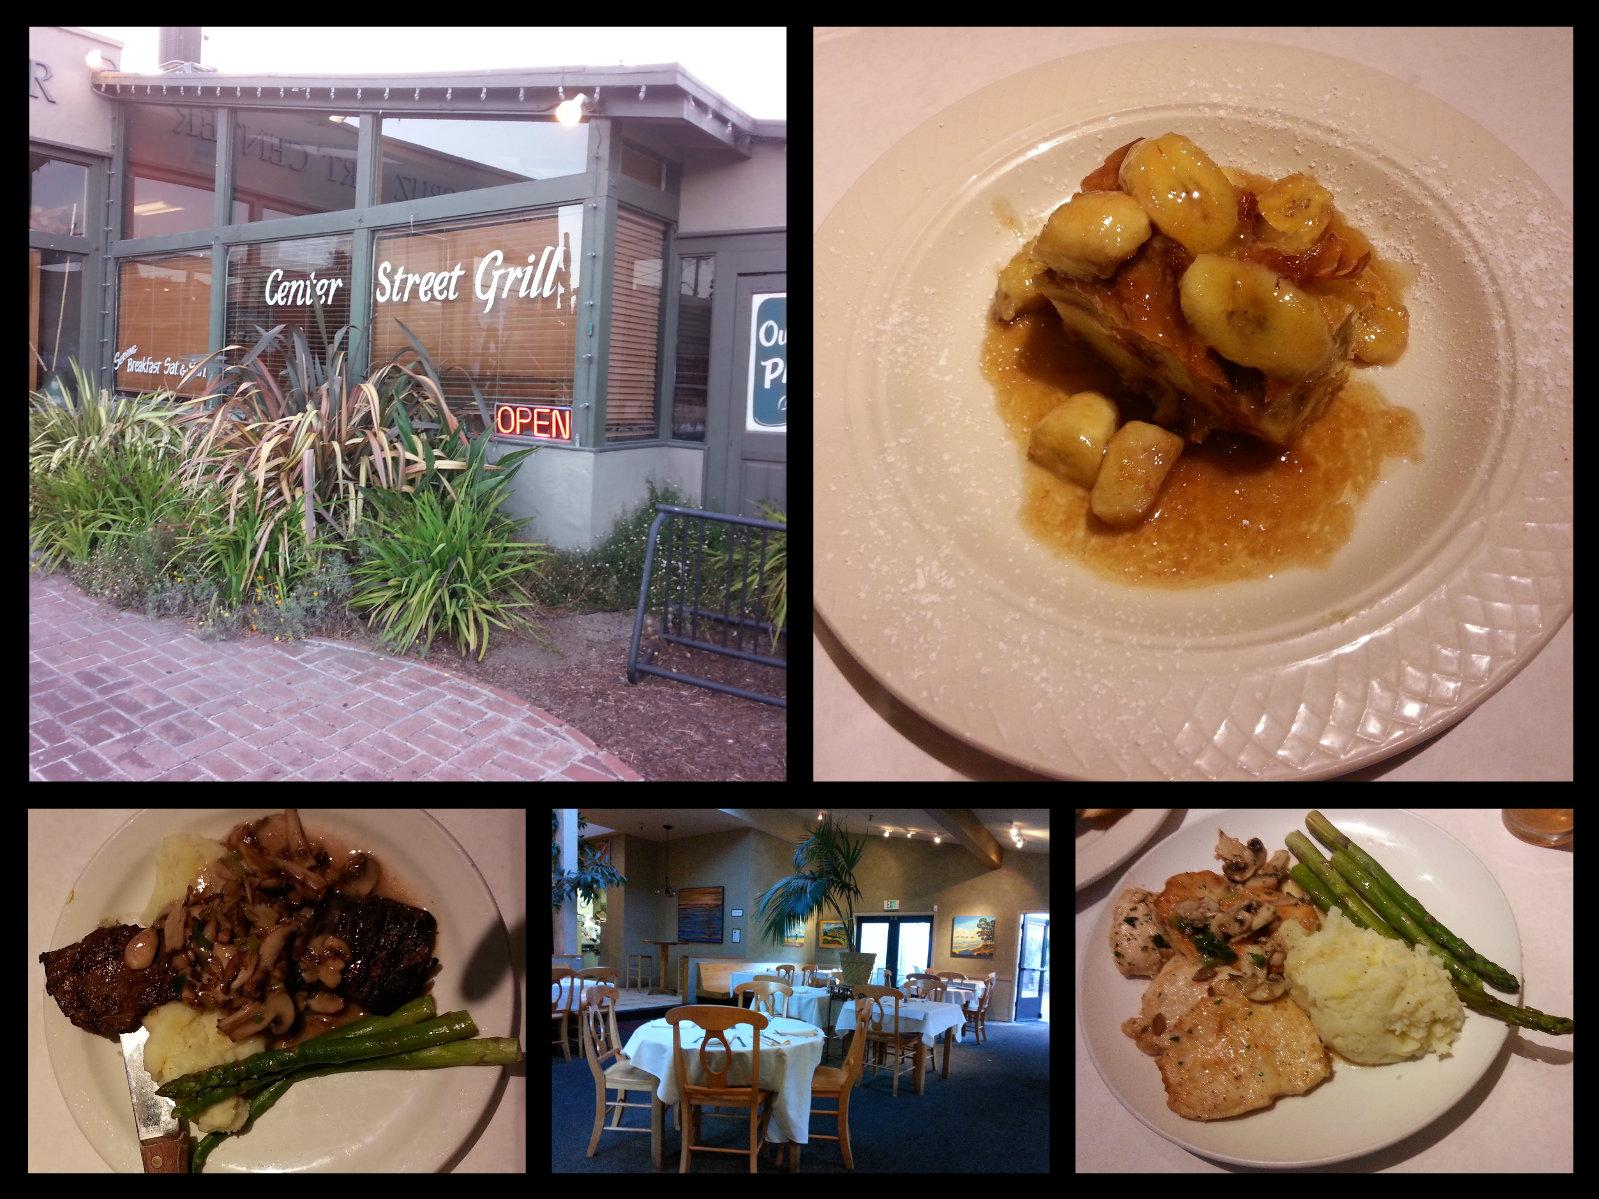 Center Street Grill, Santa Cruz - Restaurant Review